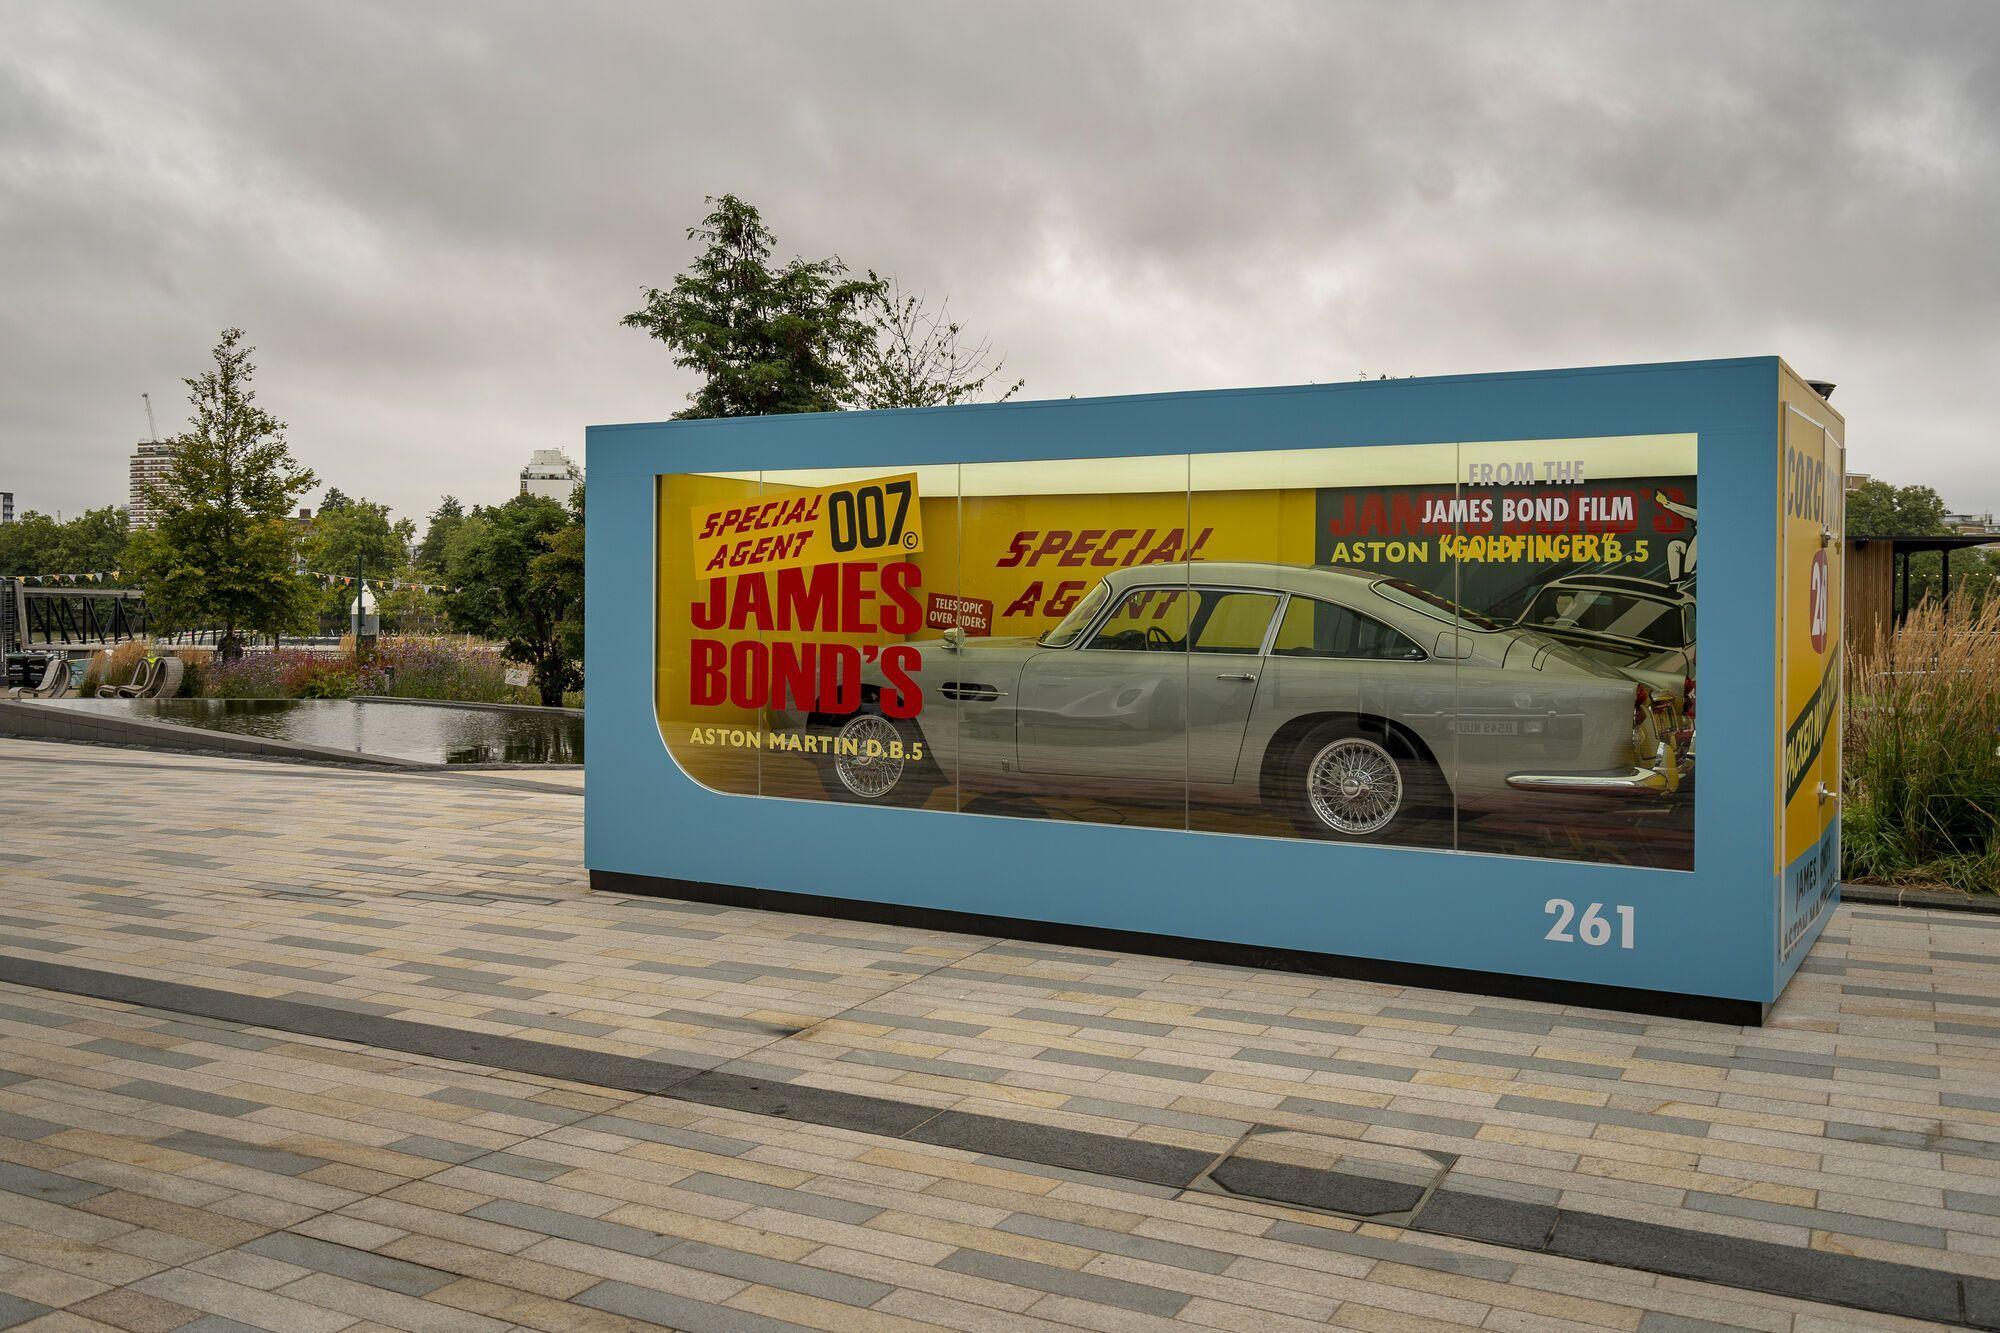 Aston Martin и Corgi Toys создали полноразмерную копию модели DB5 1965 года в фирменной коробке размером 5,66х2,7х2,7 м